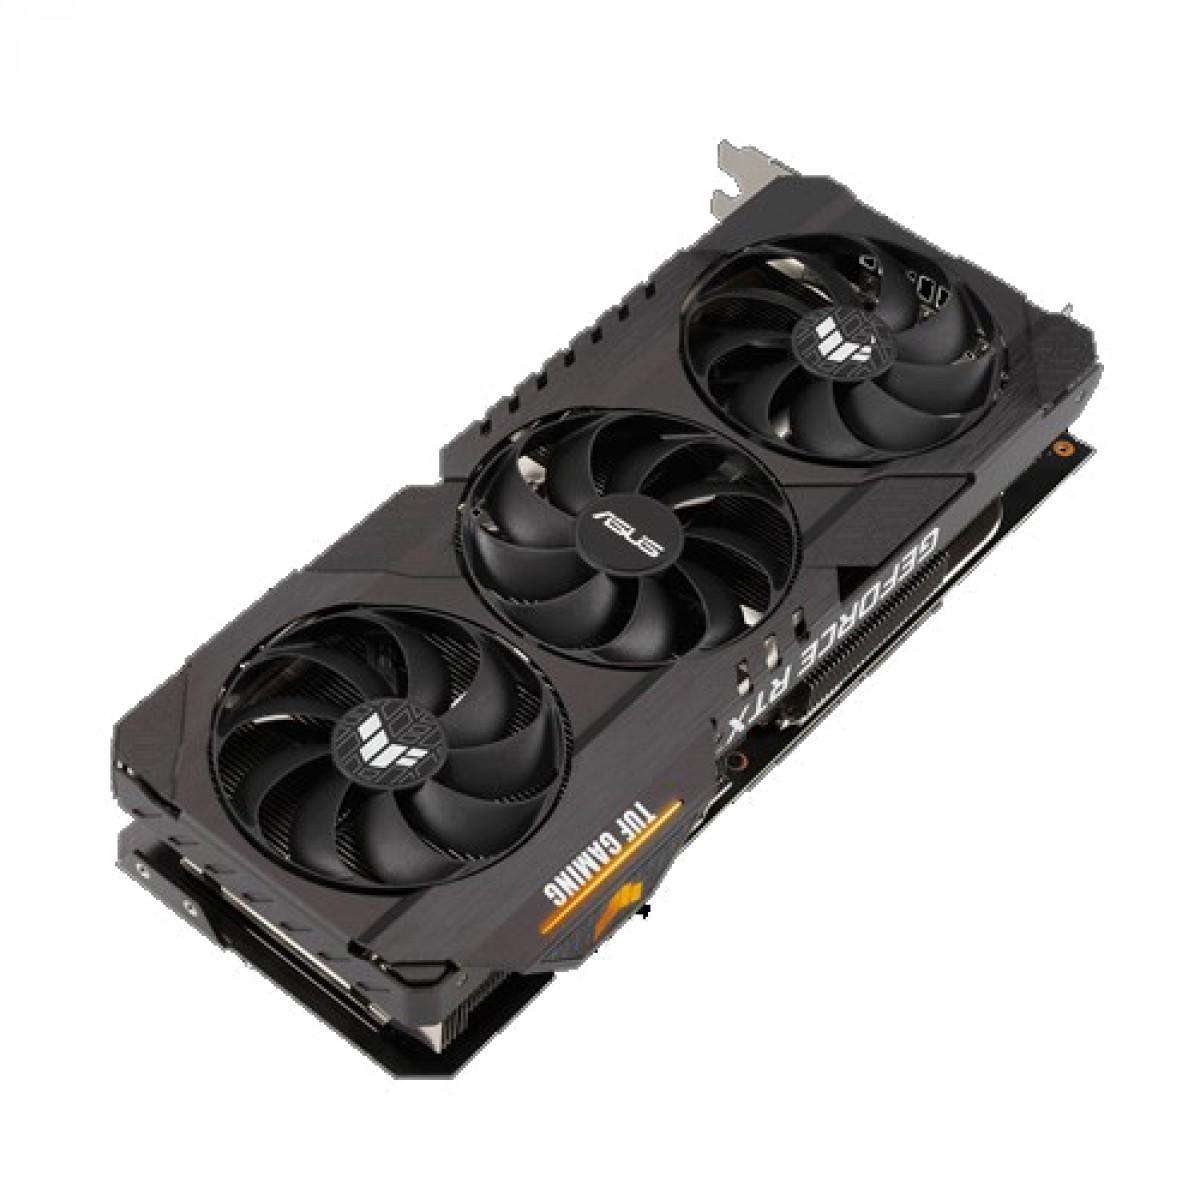 Placa de Vídeo Asus TUF Geforce, RTX 3090 OC, 24GB GDDR6X, 384bit, TUF-RTX3090-O24G-GAMING - OPEN BOX